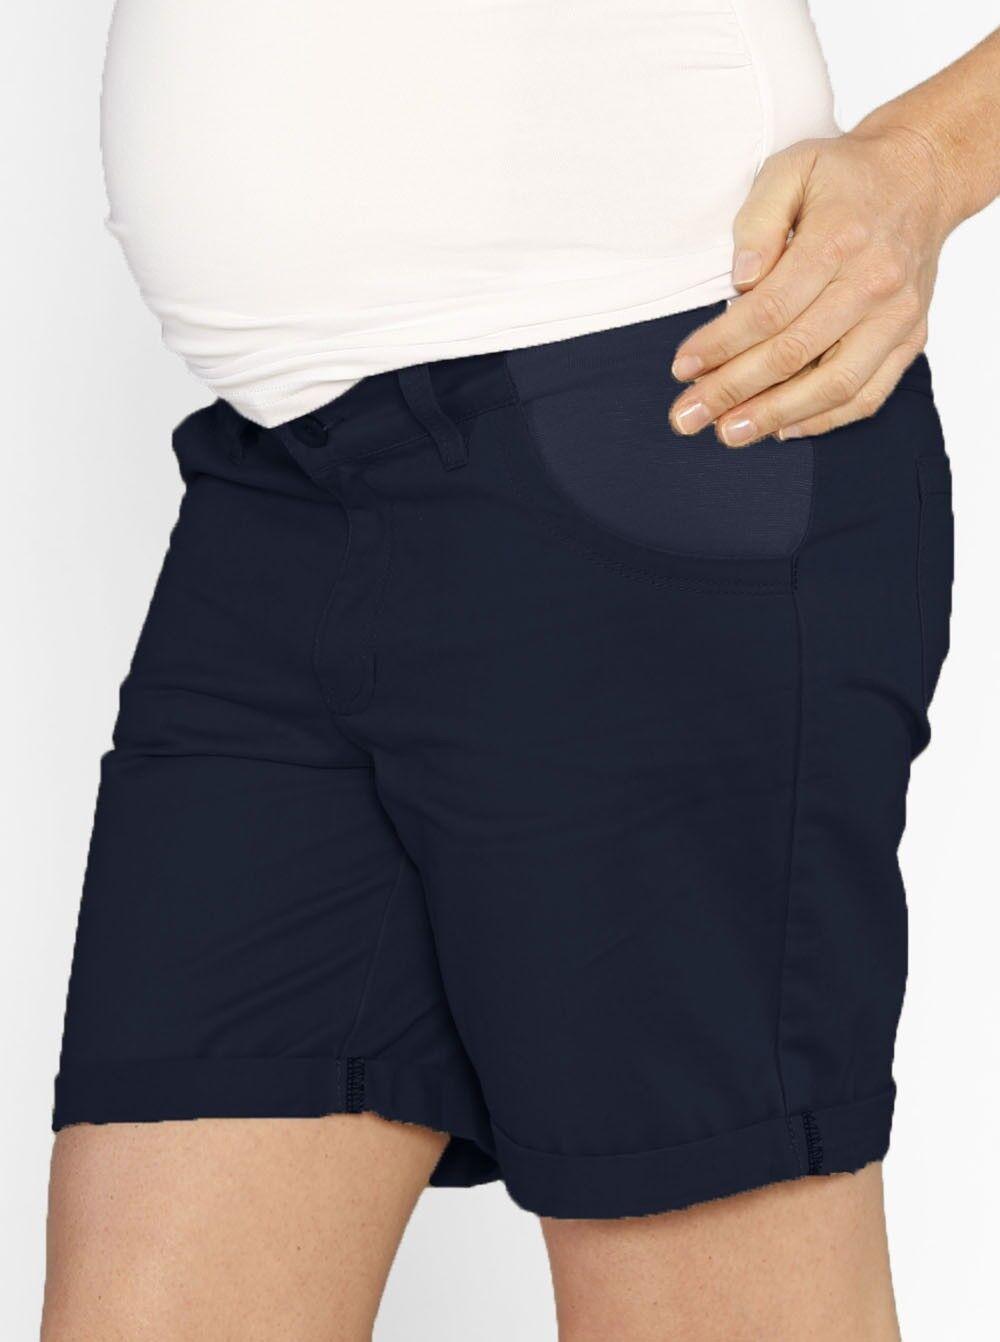 Casual Summer Cotton Shorts - Navy